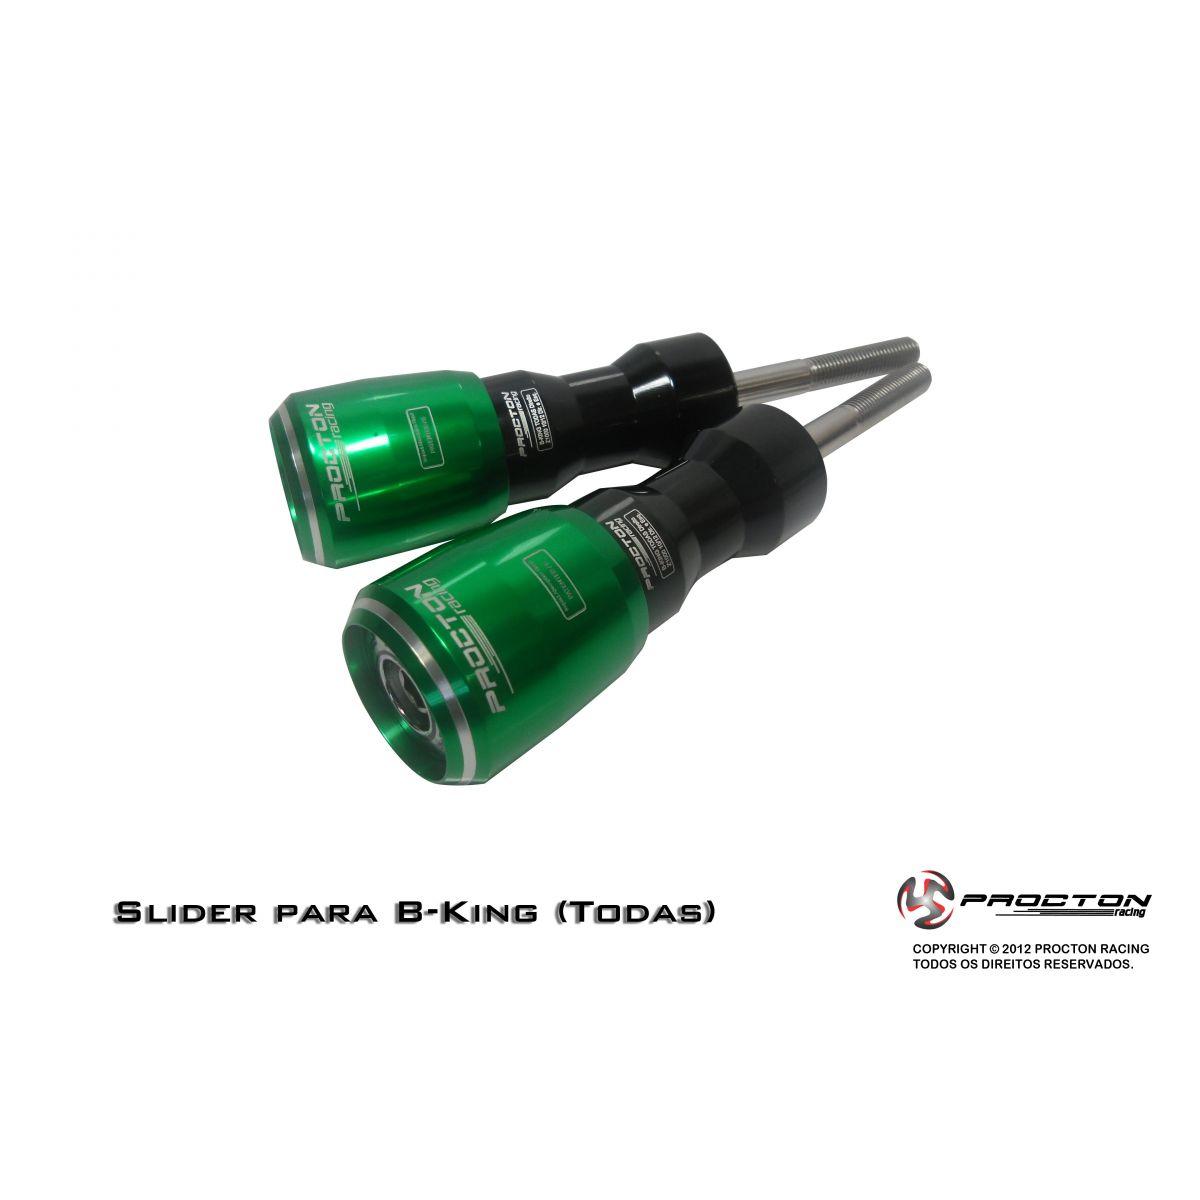 Slider Procton com Amortecimento Suzuki Bking - Todas